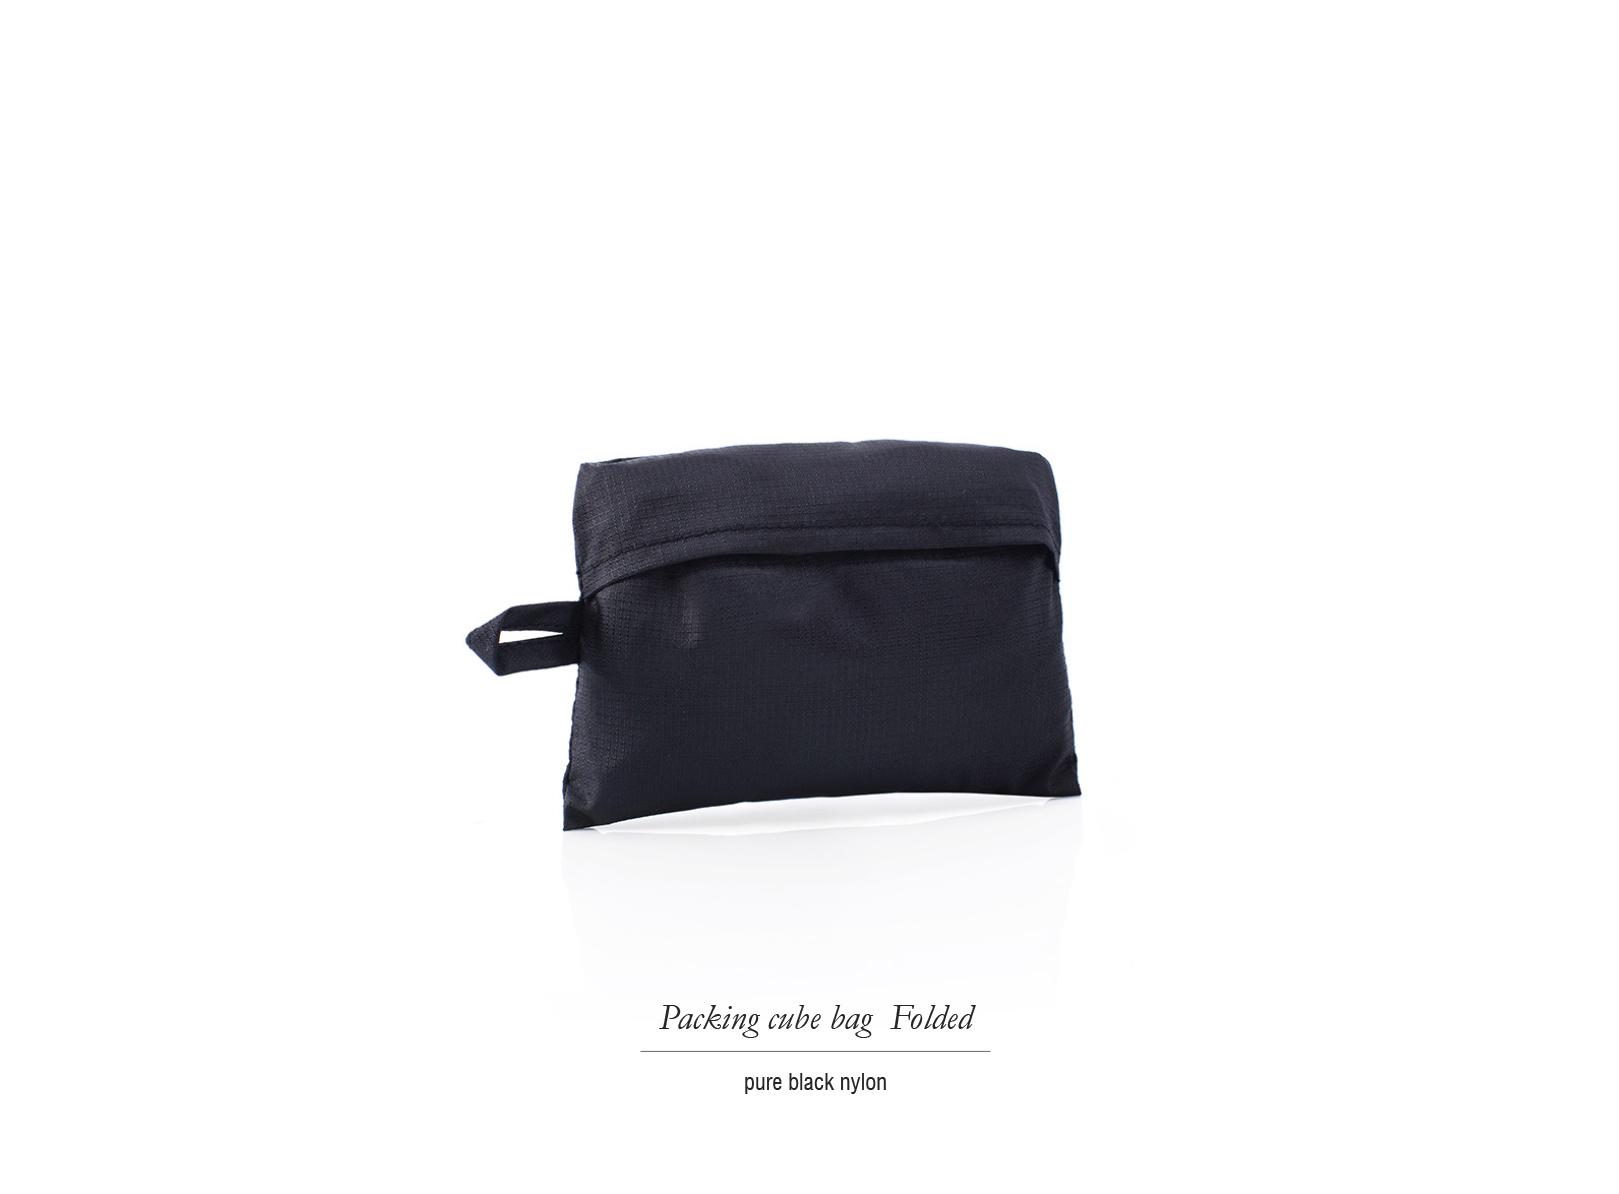 Amenity bags catalogue 2016_SHcollection_V6 107.jpg